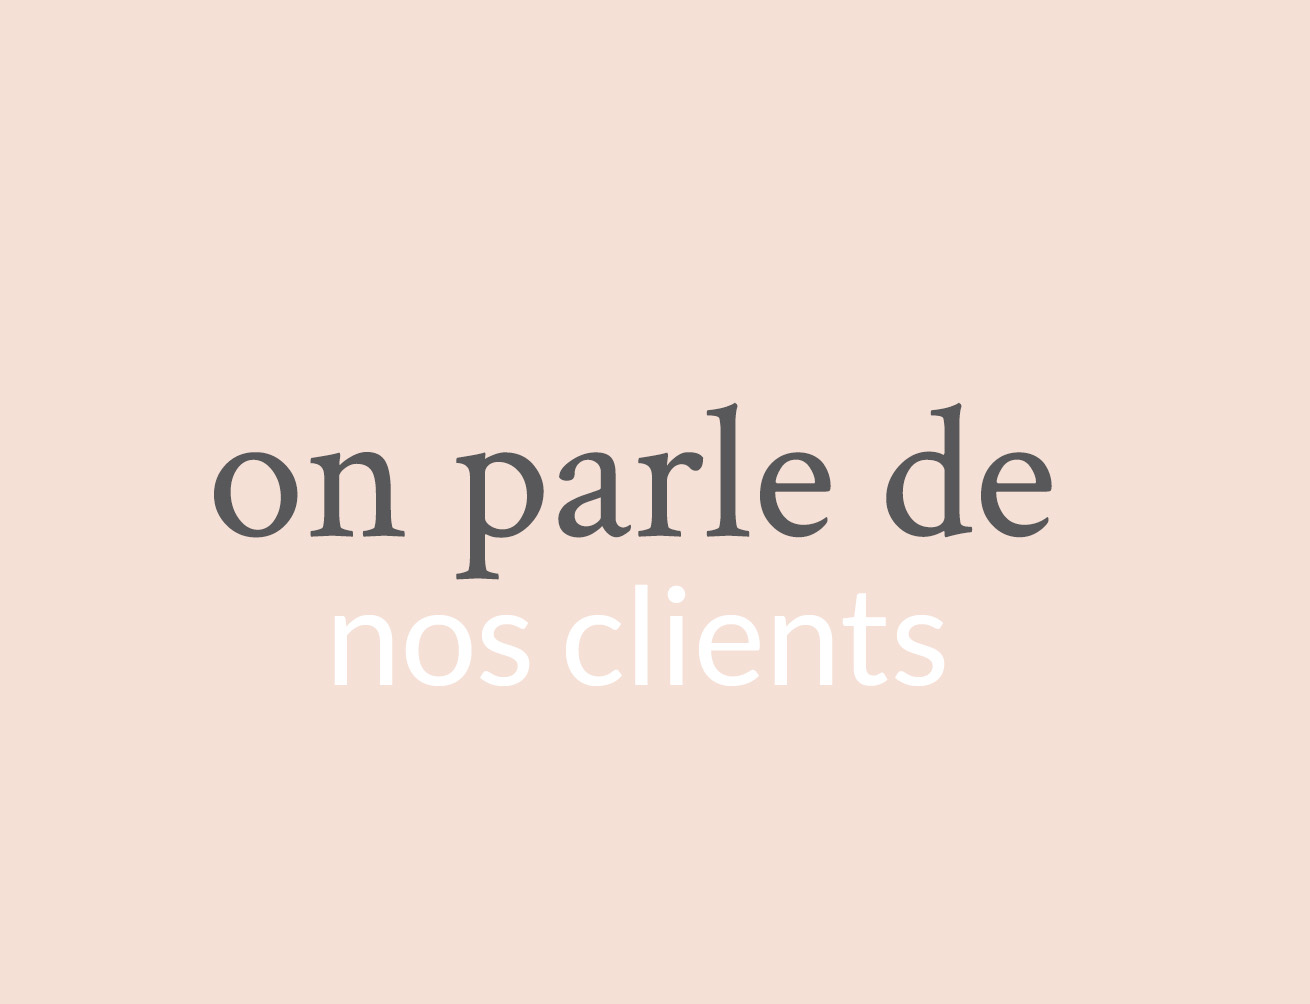 On parle de nos clients dpb agency for Dpb agency